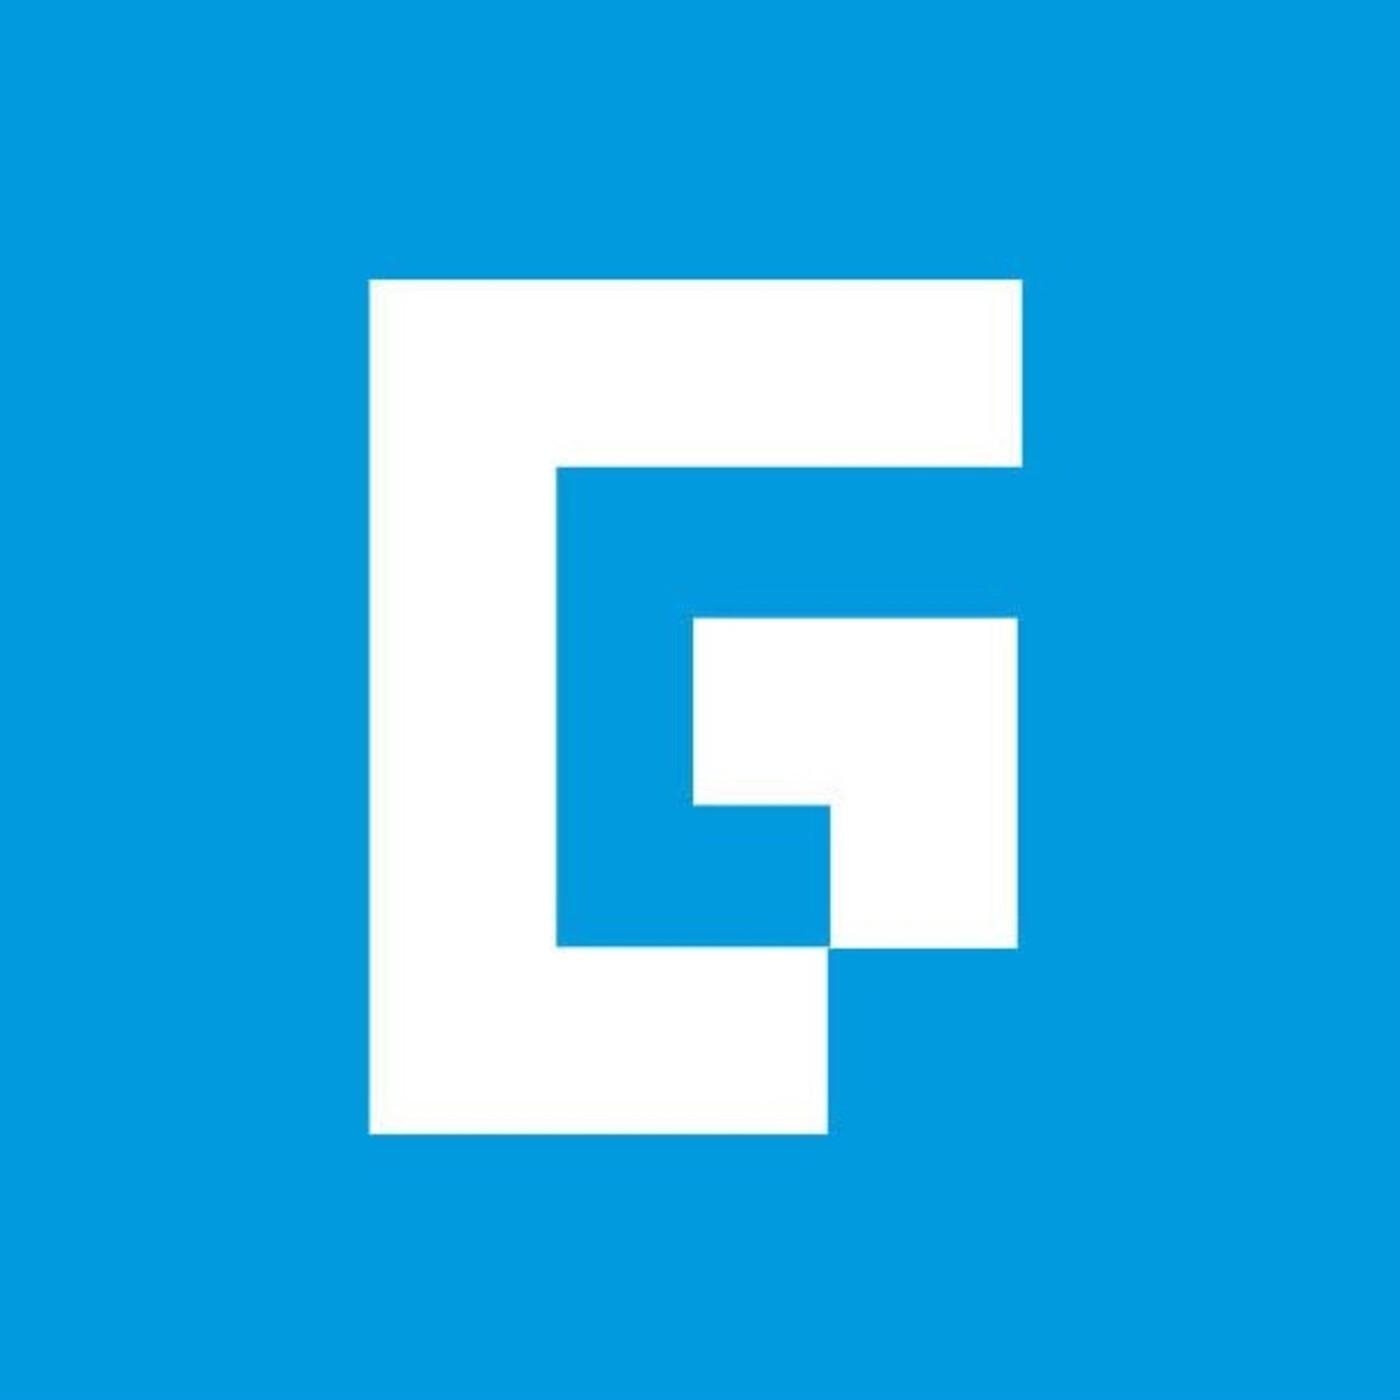 GameOver Webcast #441 - Assassin's Creed Valhalla, Cyberpunk 2077, Επιτραπέζ